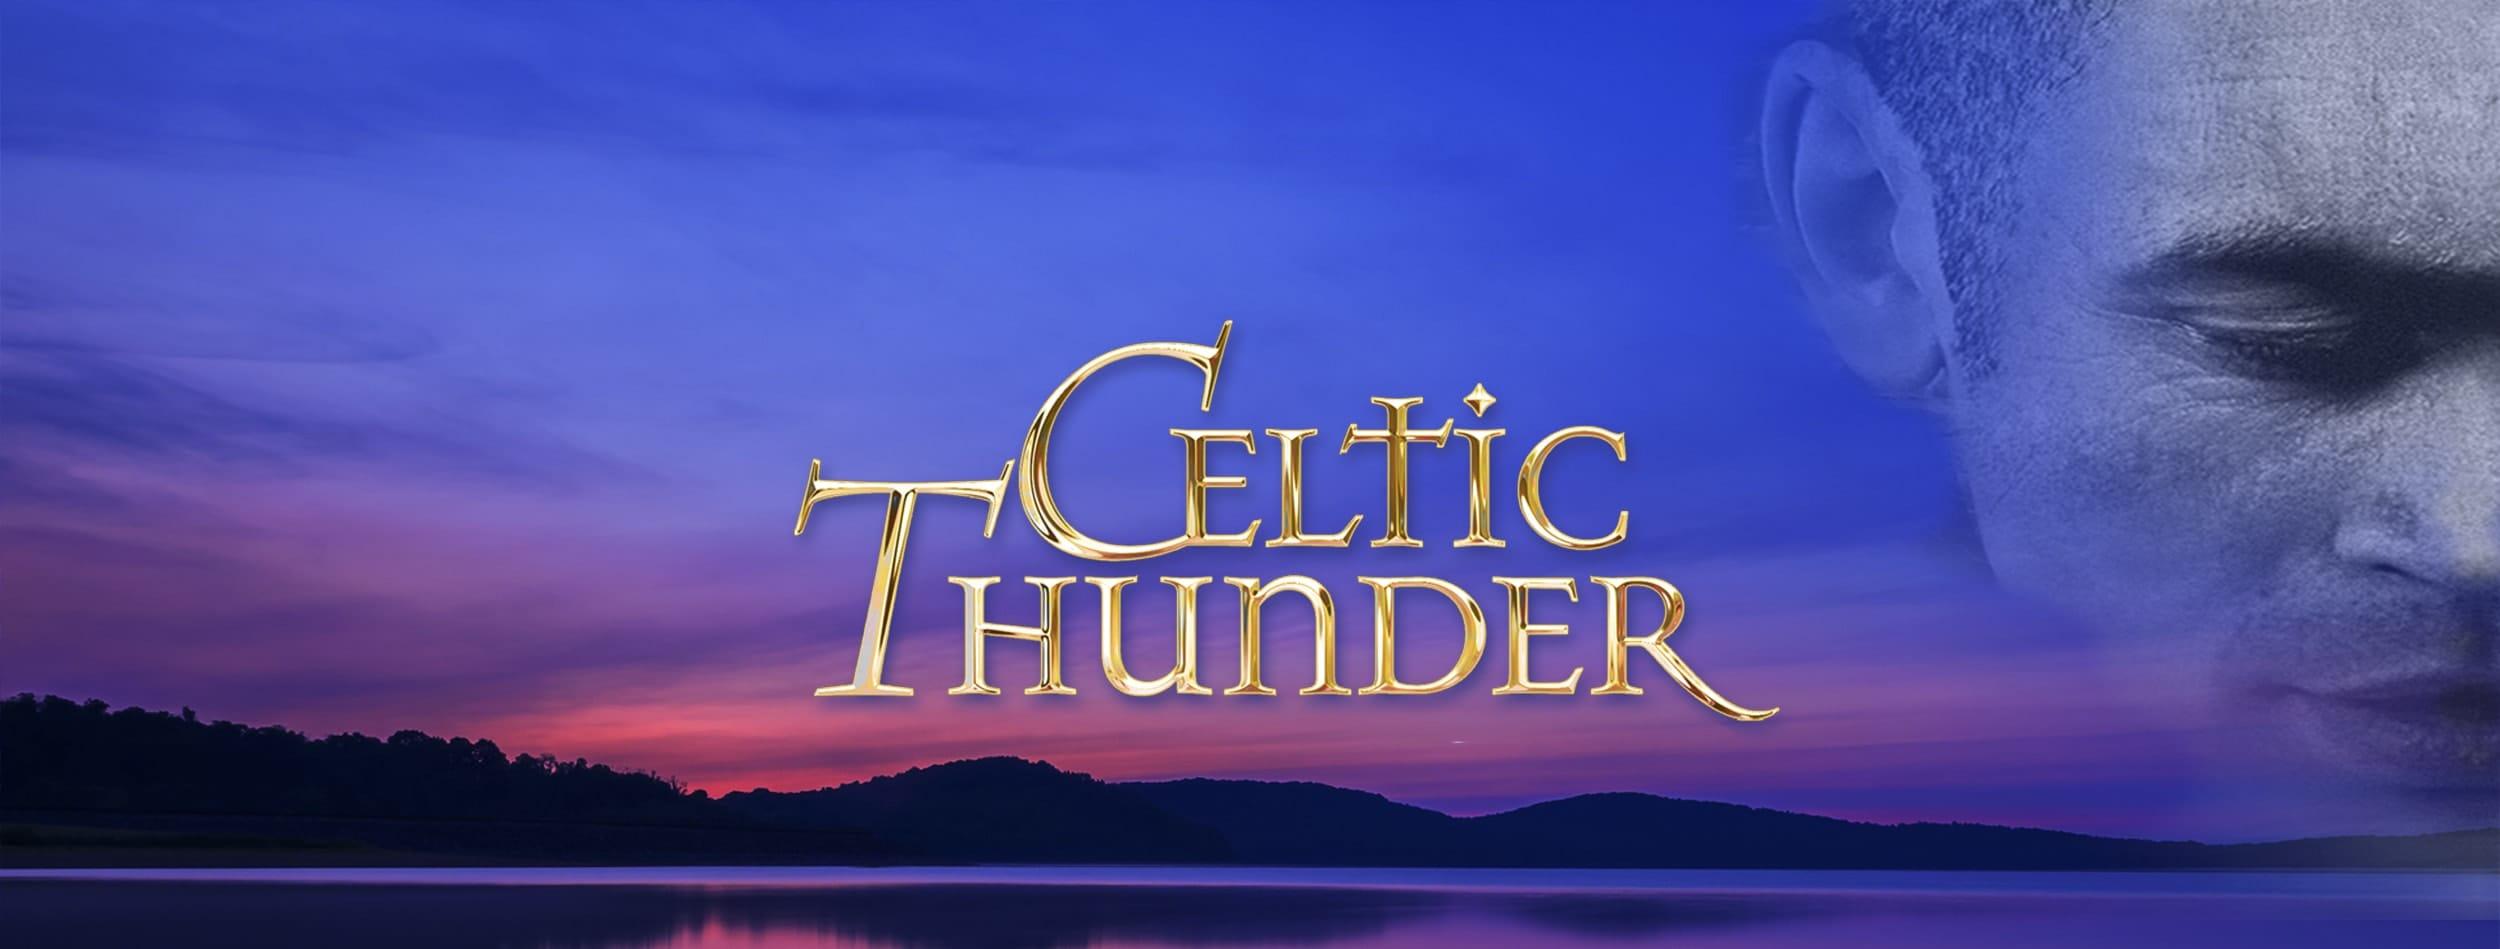 celtic dating service matchmaking dota 2 parenteser